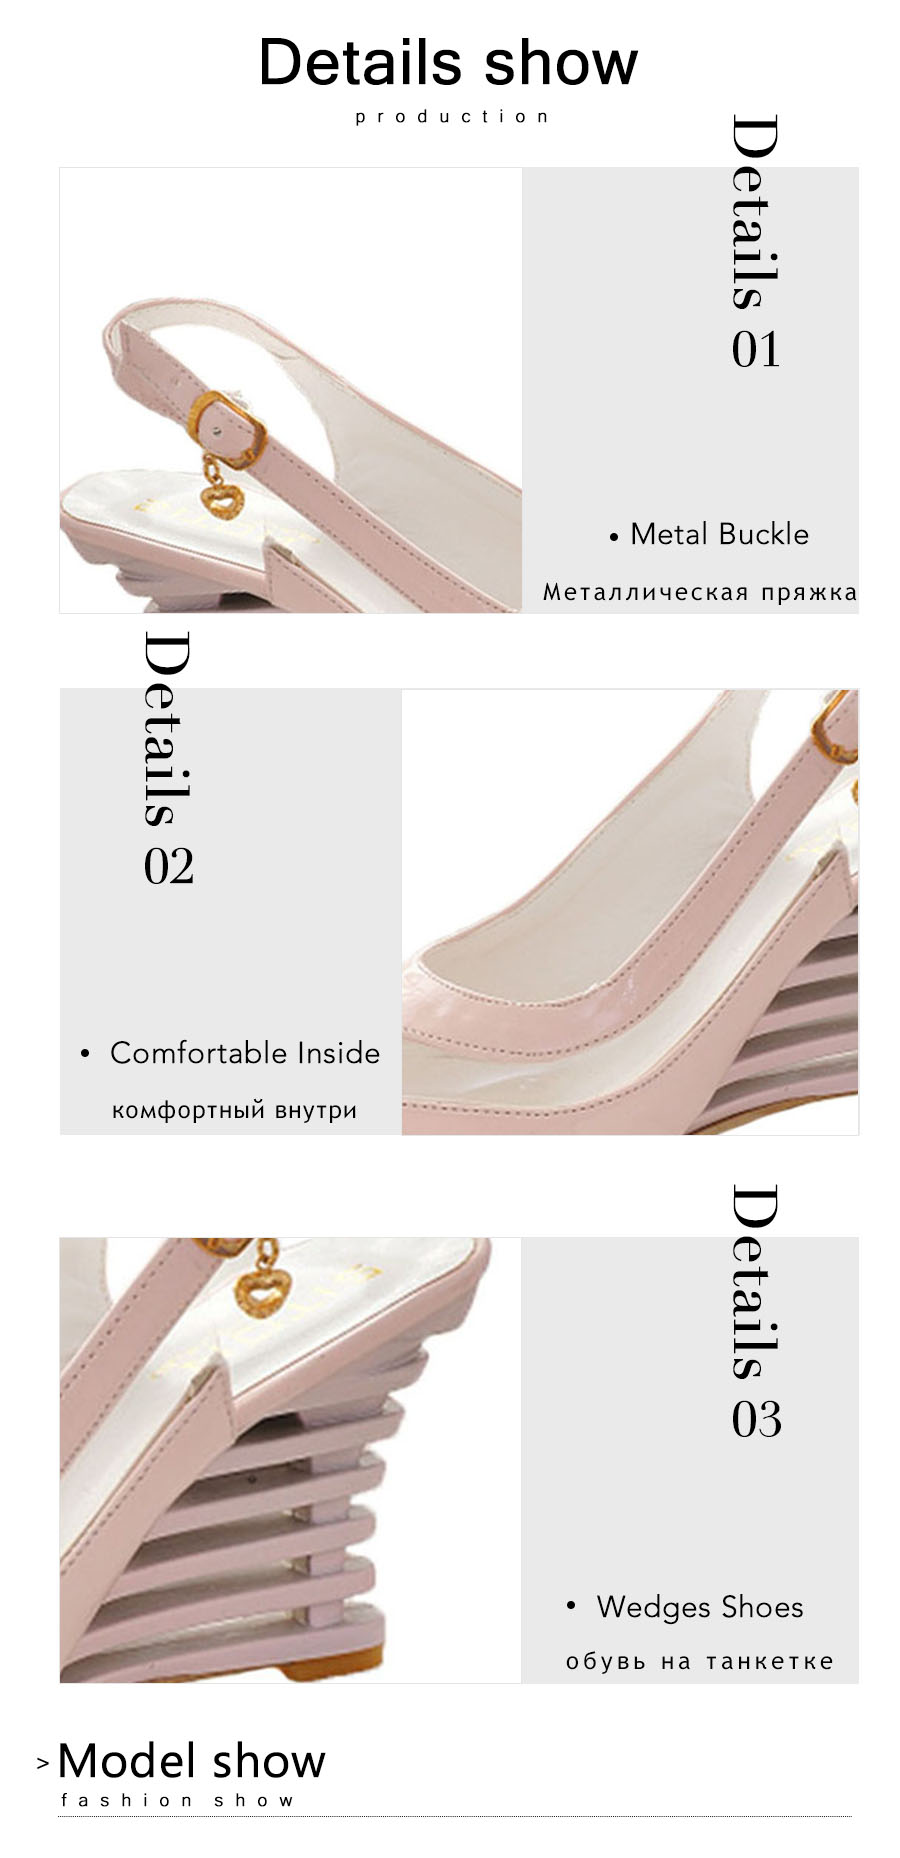 Taoffen 2019 New Women Heel Sandals Buckle Open Toe High Wedge Shoes Women's Summer Shoes Sexy Women Shoes Footwear Size 34-43